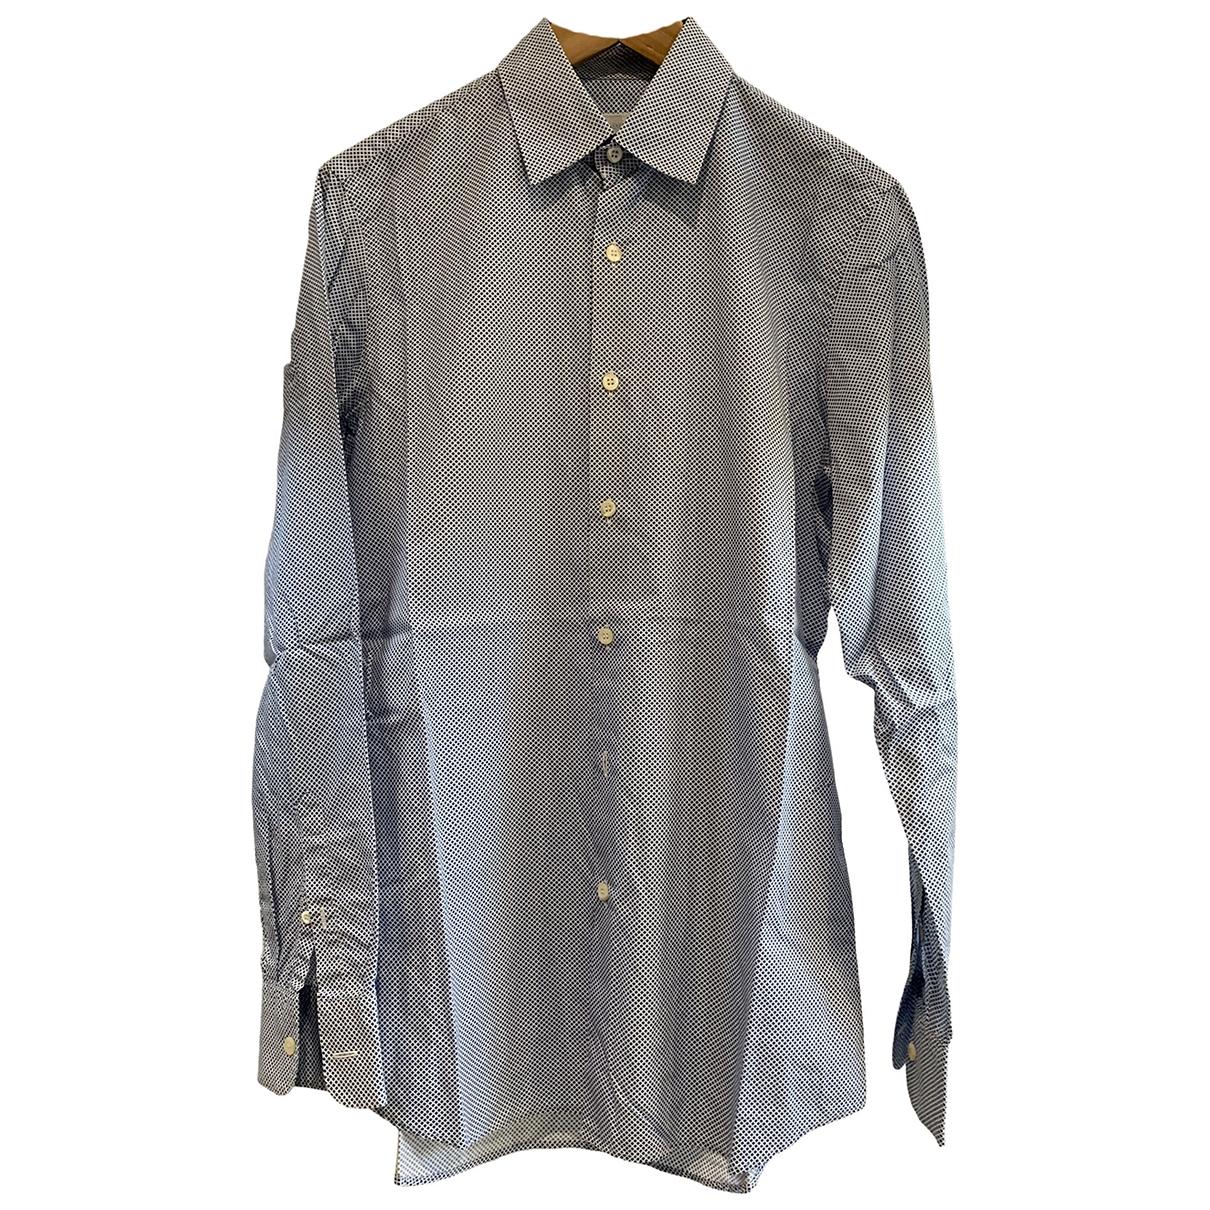 Prada \N Blue Cotton Shirts for Men 15 UK - US (tour de cou / collar)